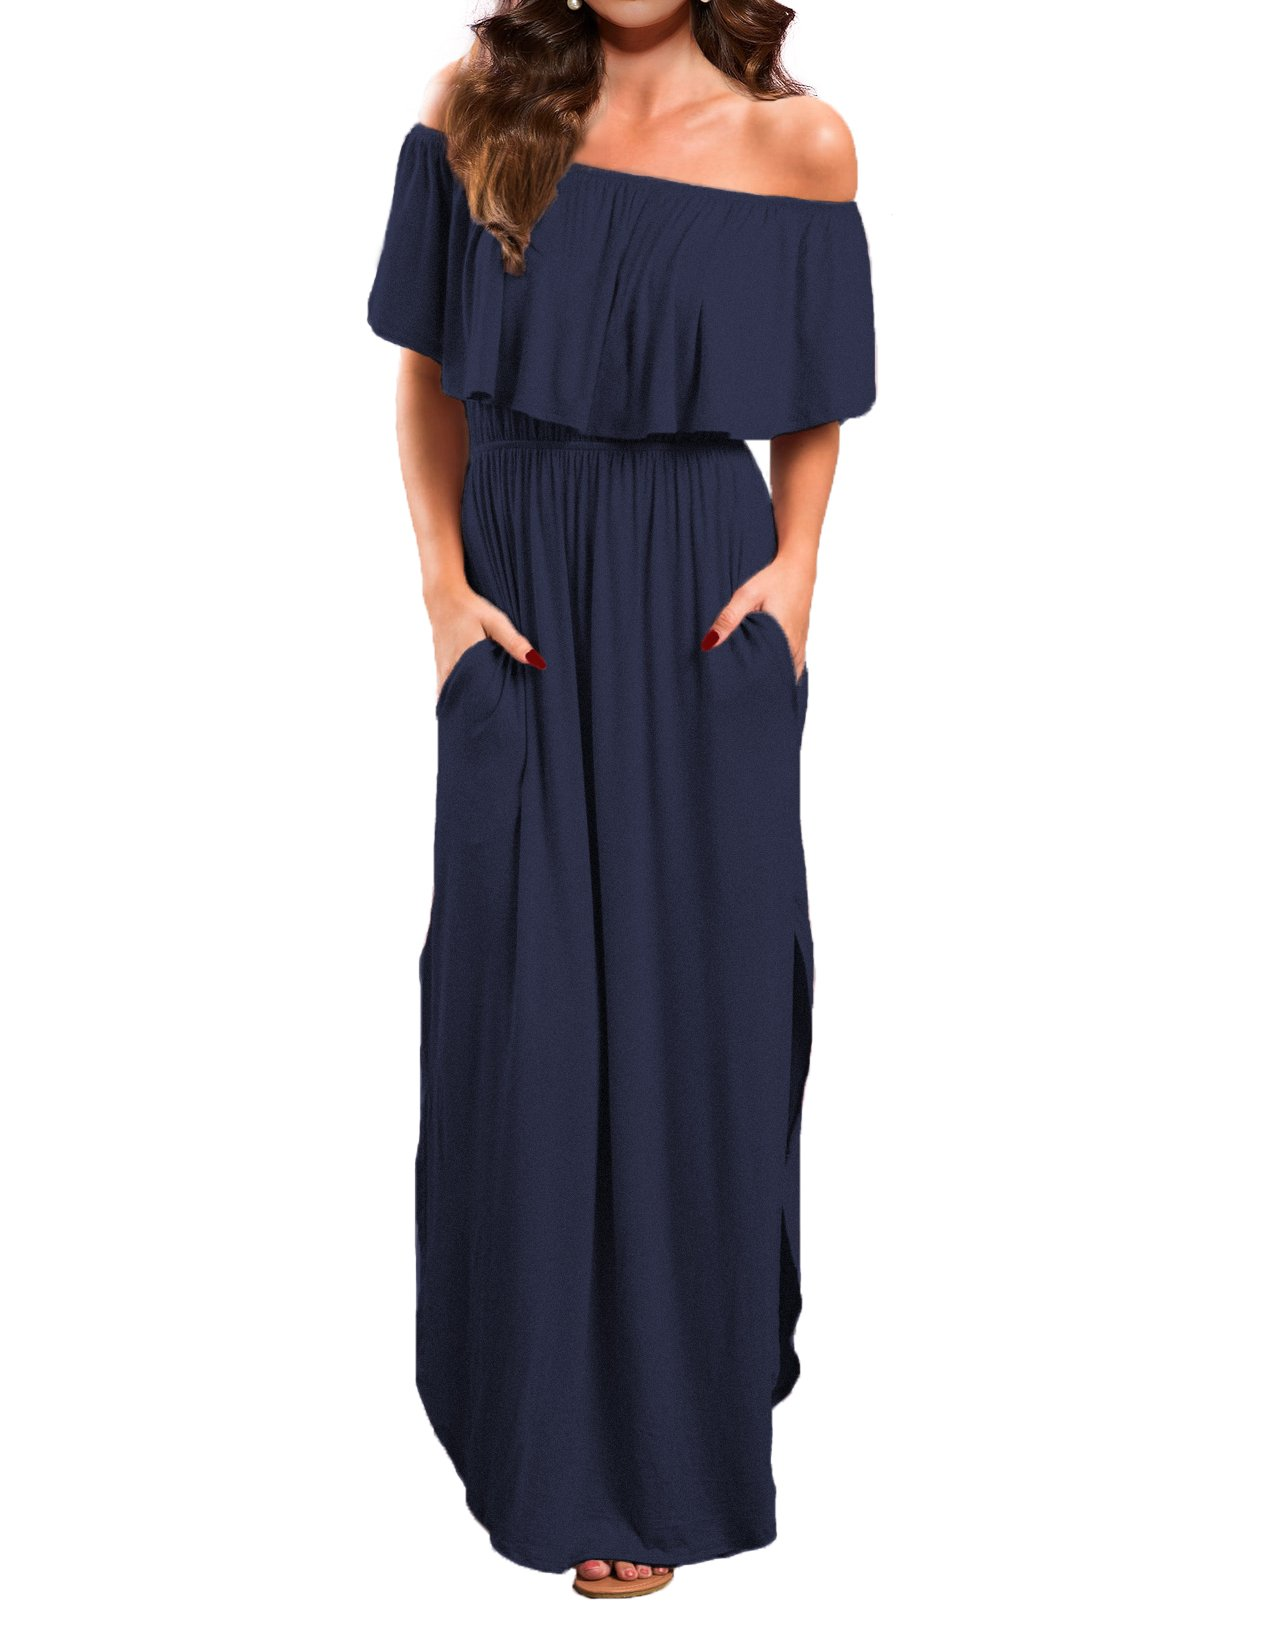 VERABENDI Women's Off Shoulder Summer Casual Long Ruffle Beach Maxi Dress with Pockets Navy Blue L